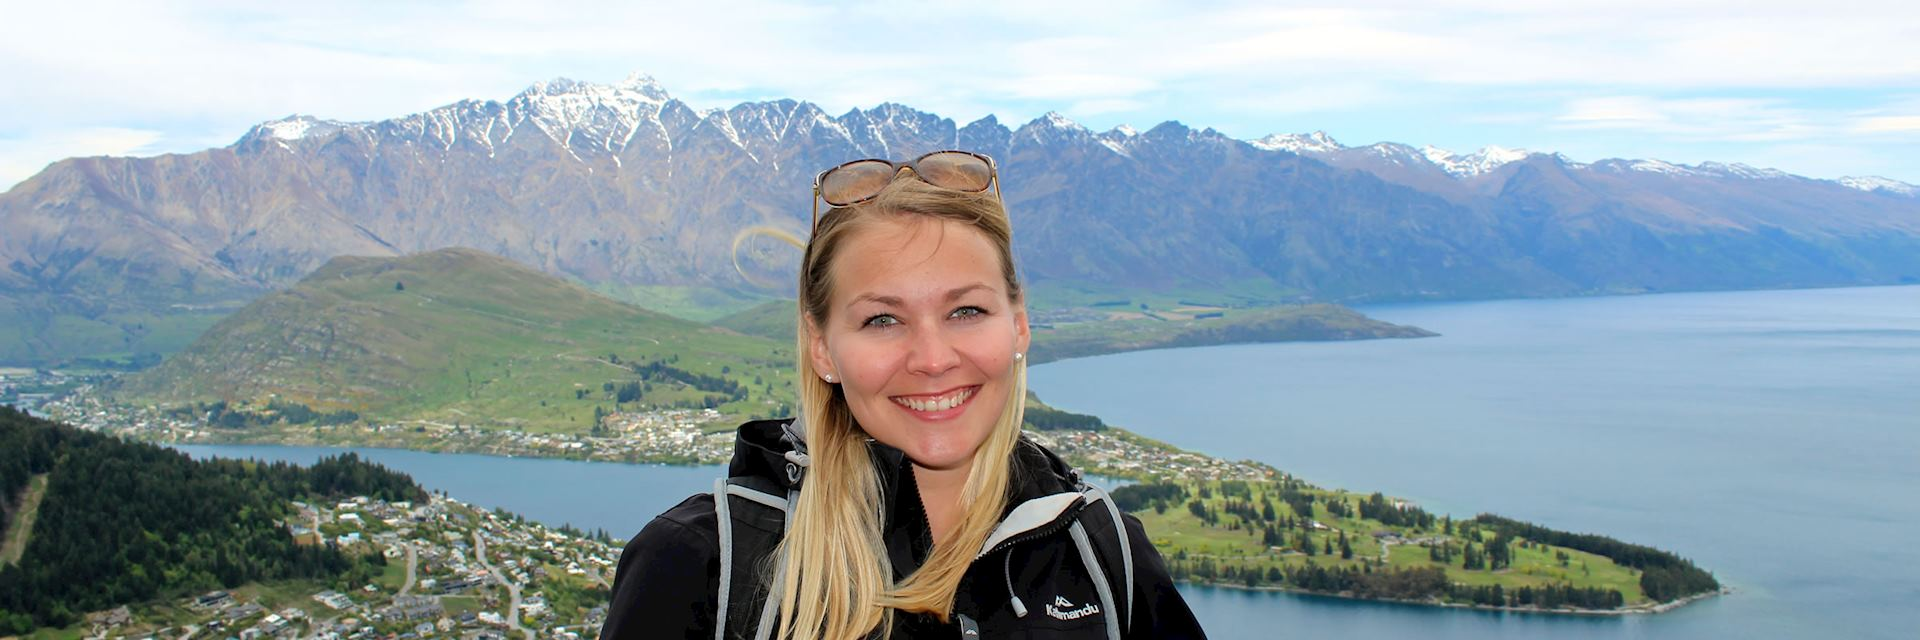 Janin at the Skyline Gondola lookout in Queenstown, New Zealand